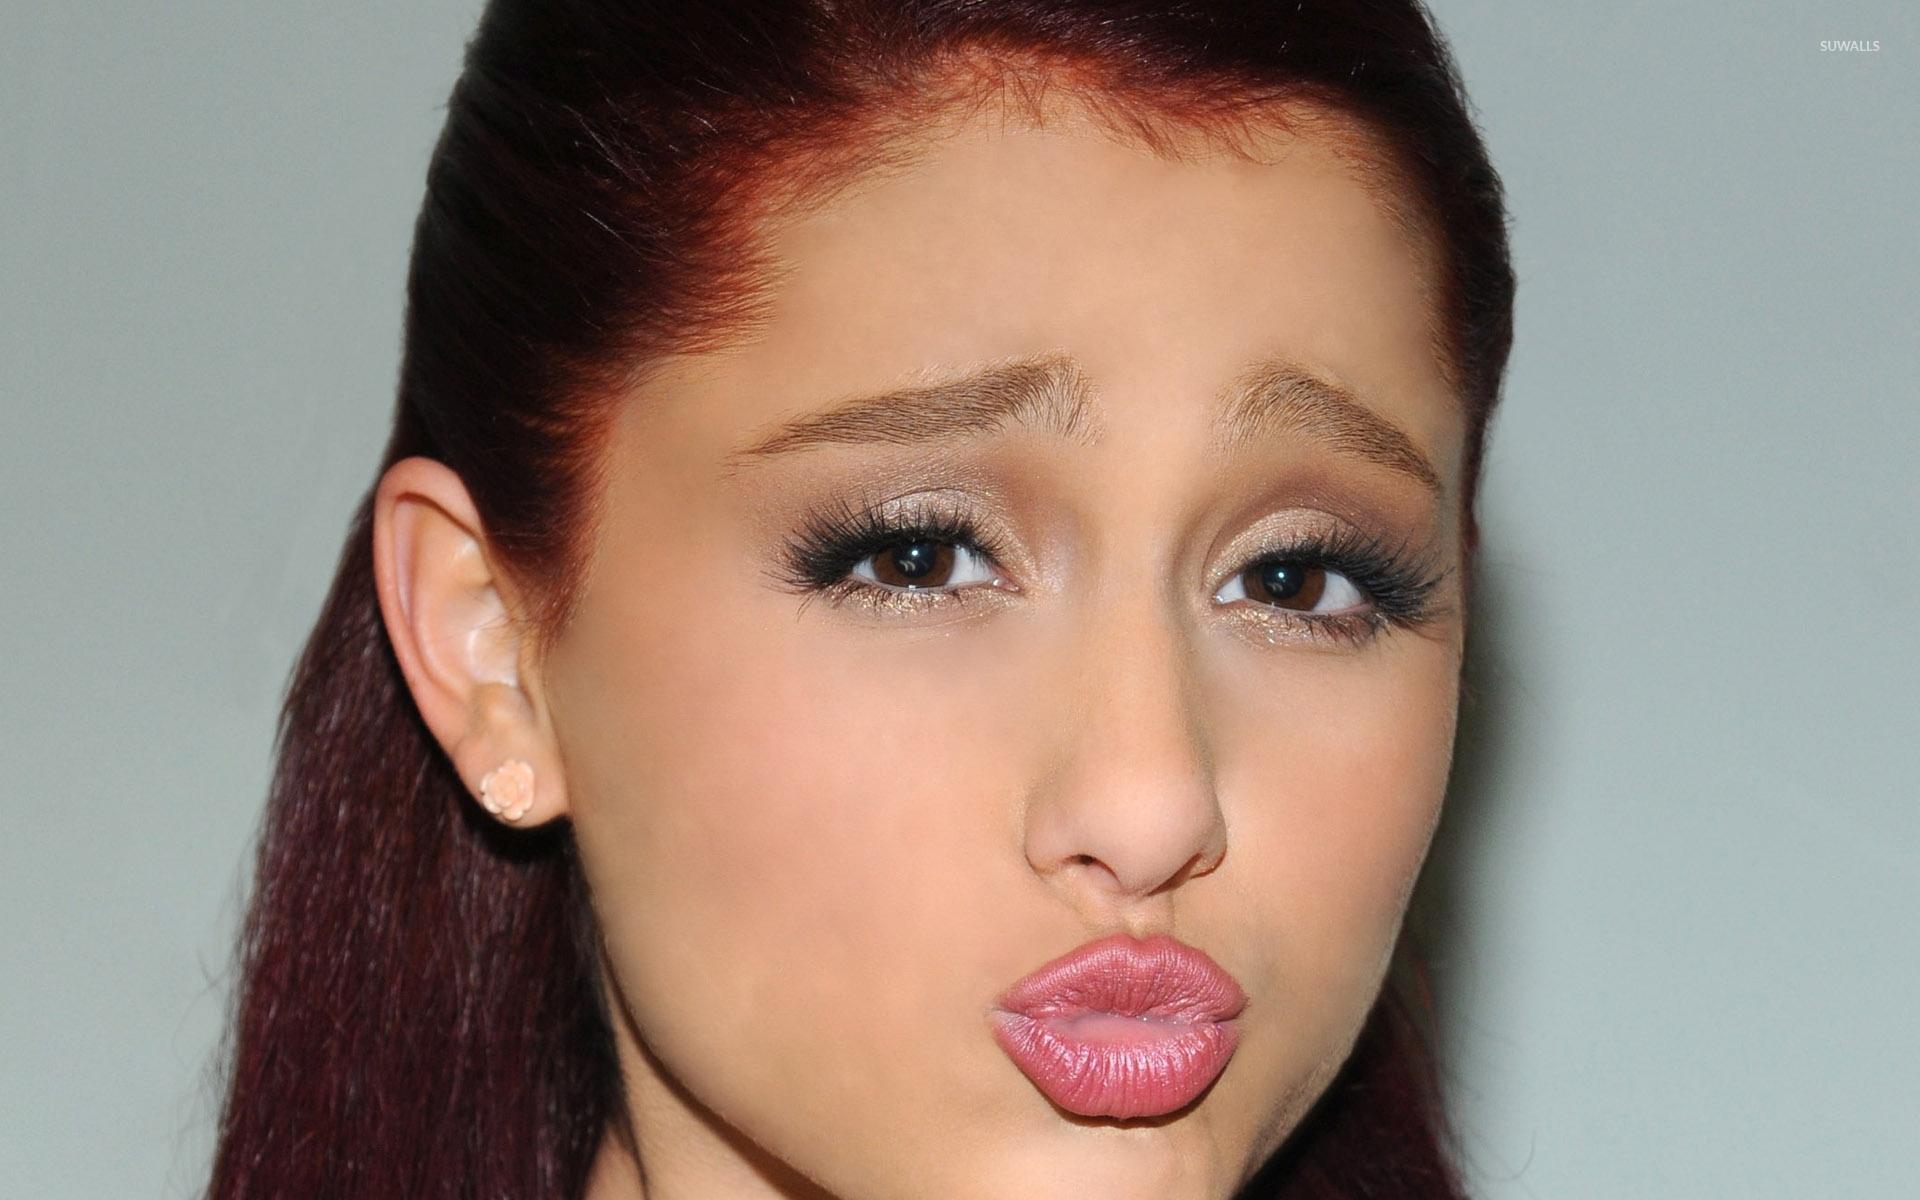 35  Ariana Grande wallpapers HD download free